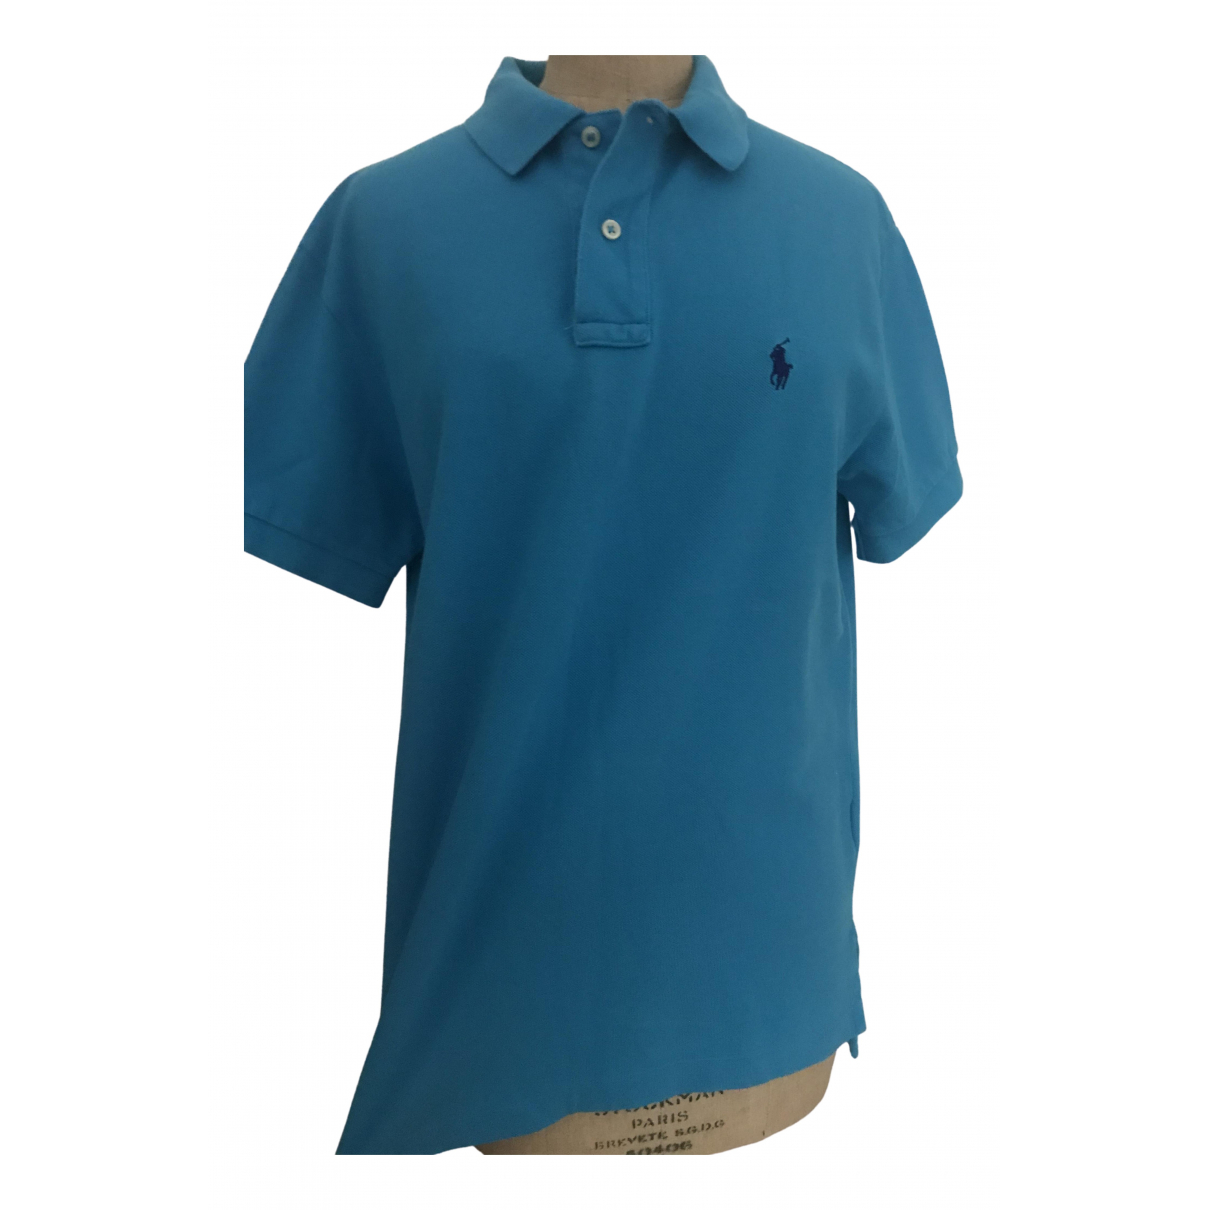 Polo Ralph Lauren - Polos Polo classique manches courtes pour homme en coton - bleu